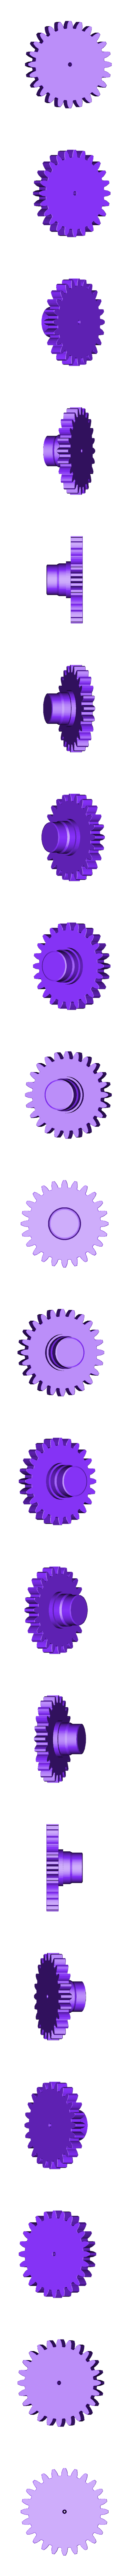 gear_base_leg.stl Download free STL file RoboDog v1.0 • 3D printing object, robolab19